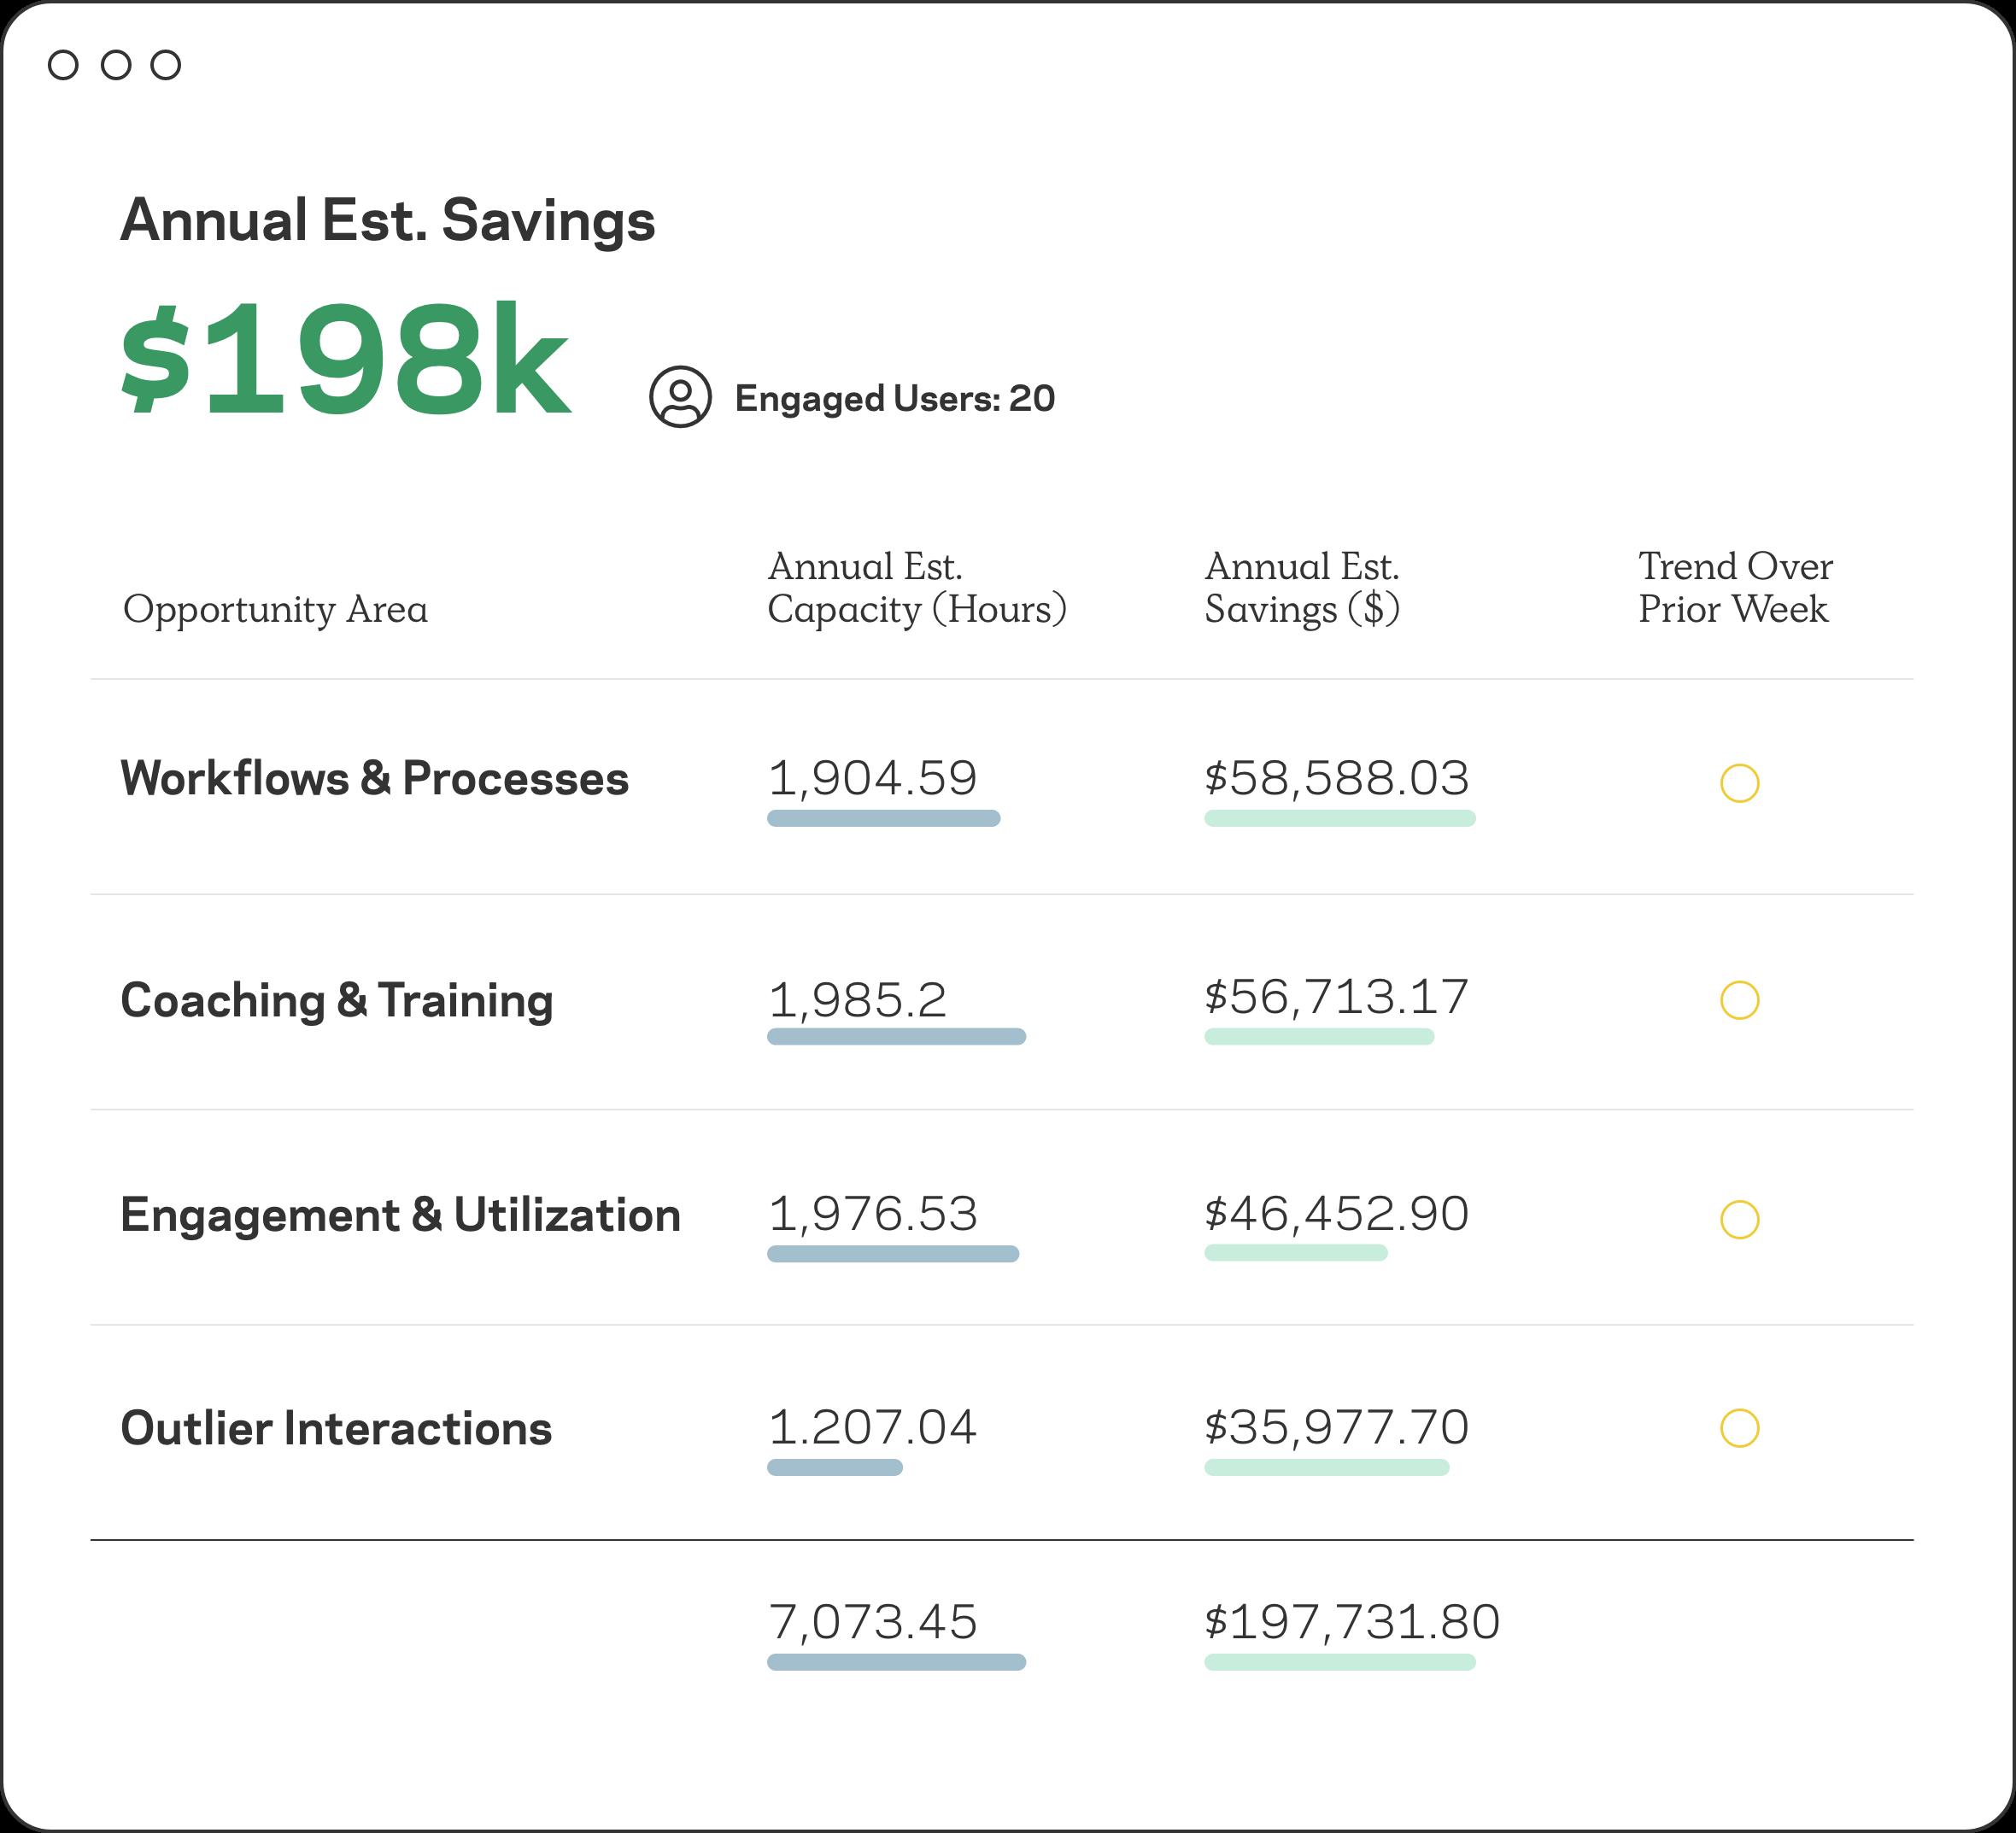 Annual savings estimation per workflow